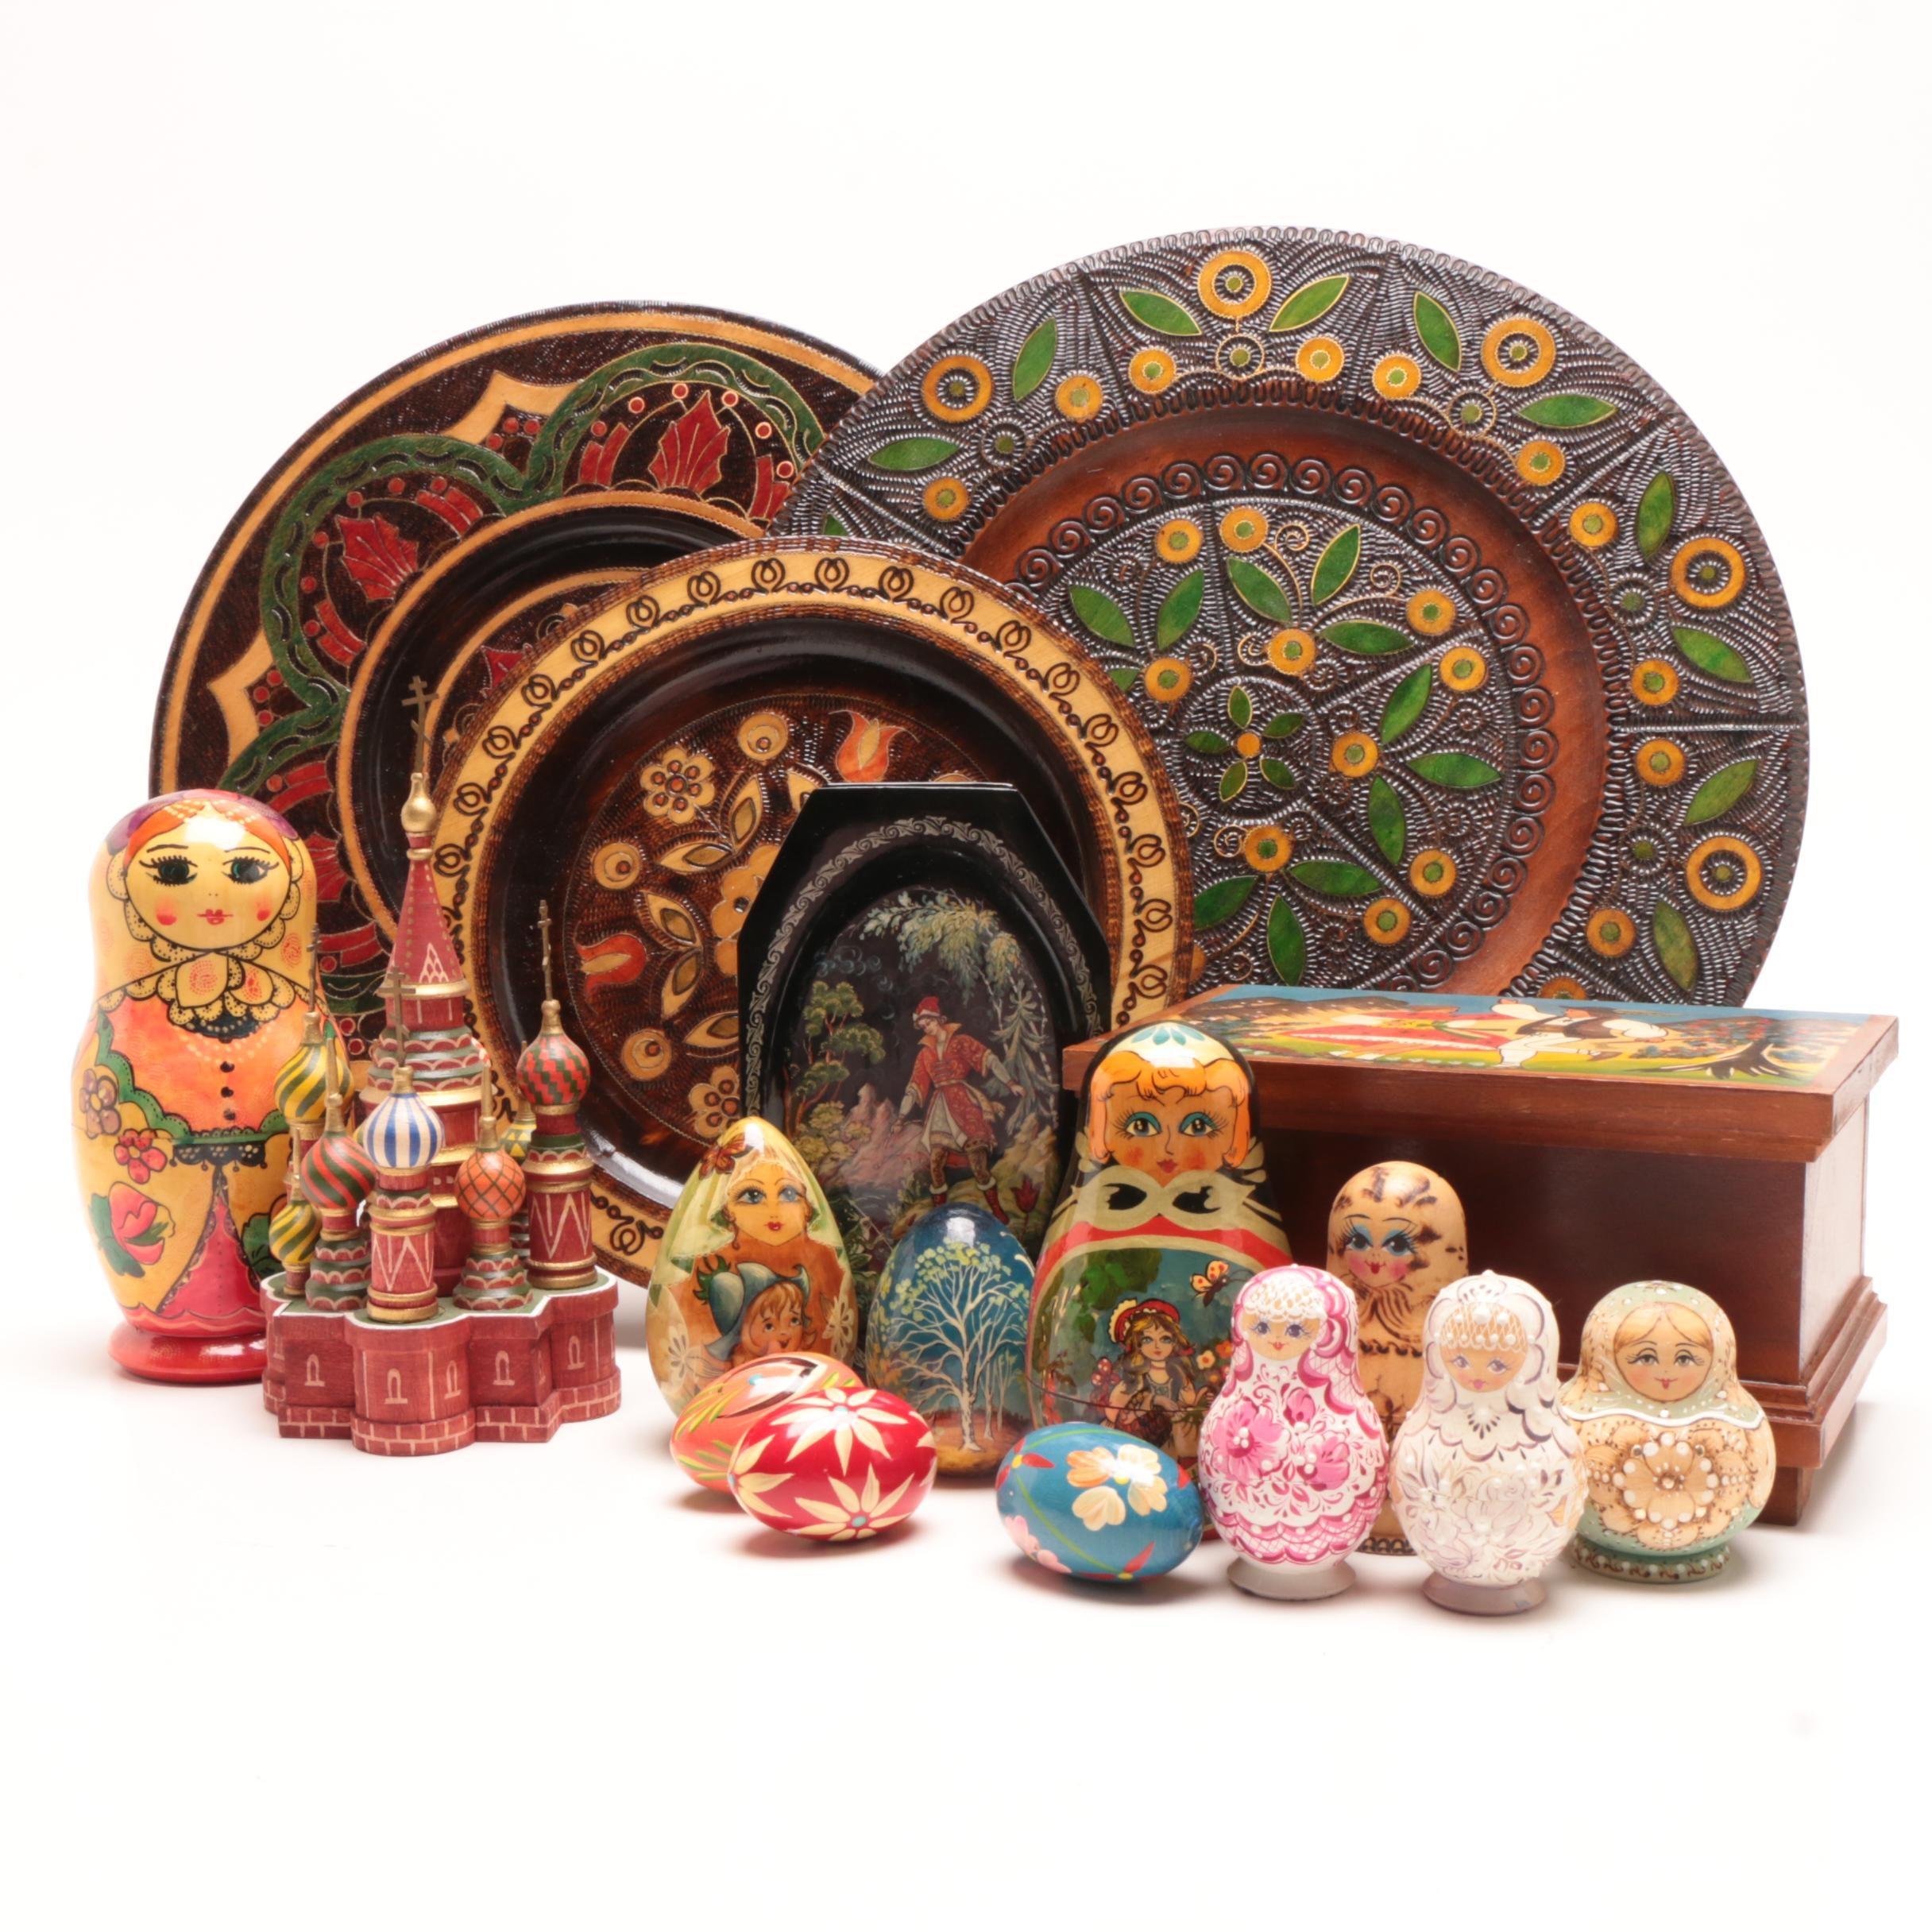 Russian and Polish Wooden Folk Art